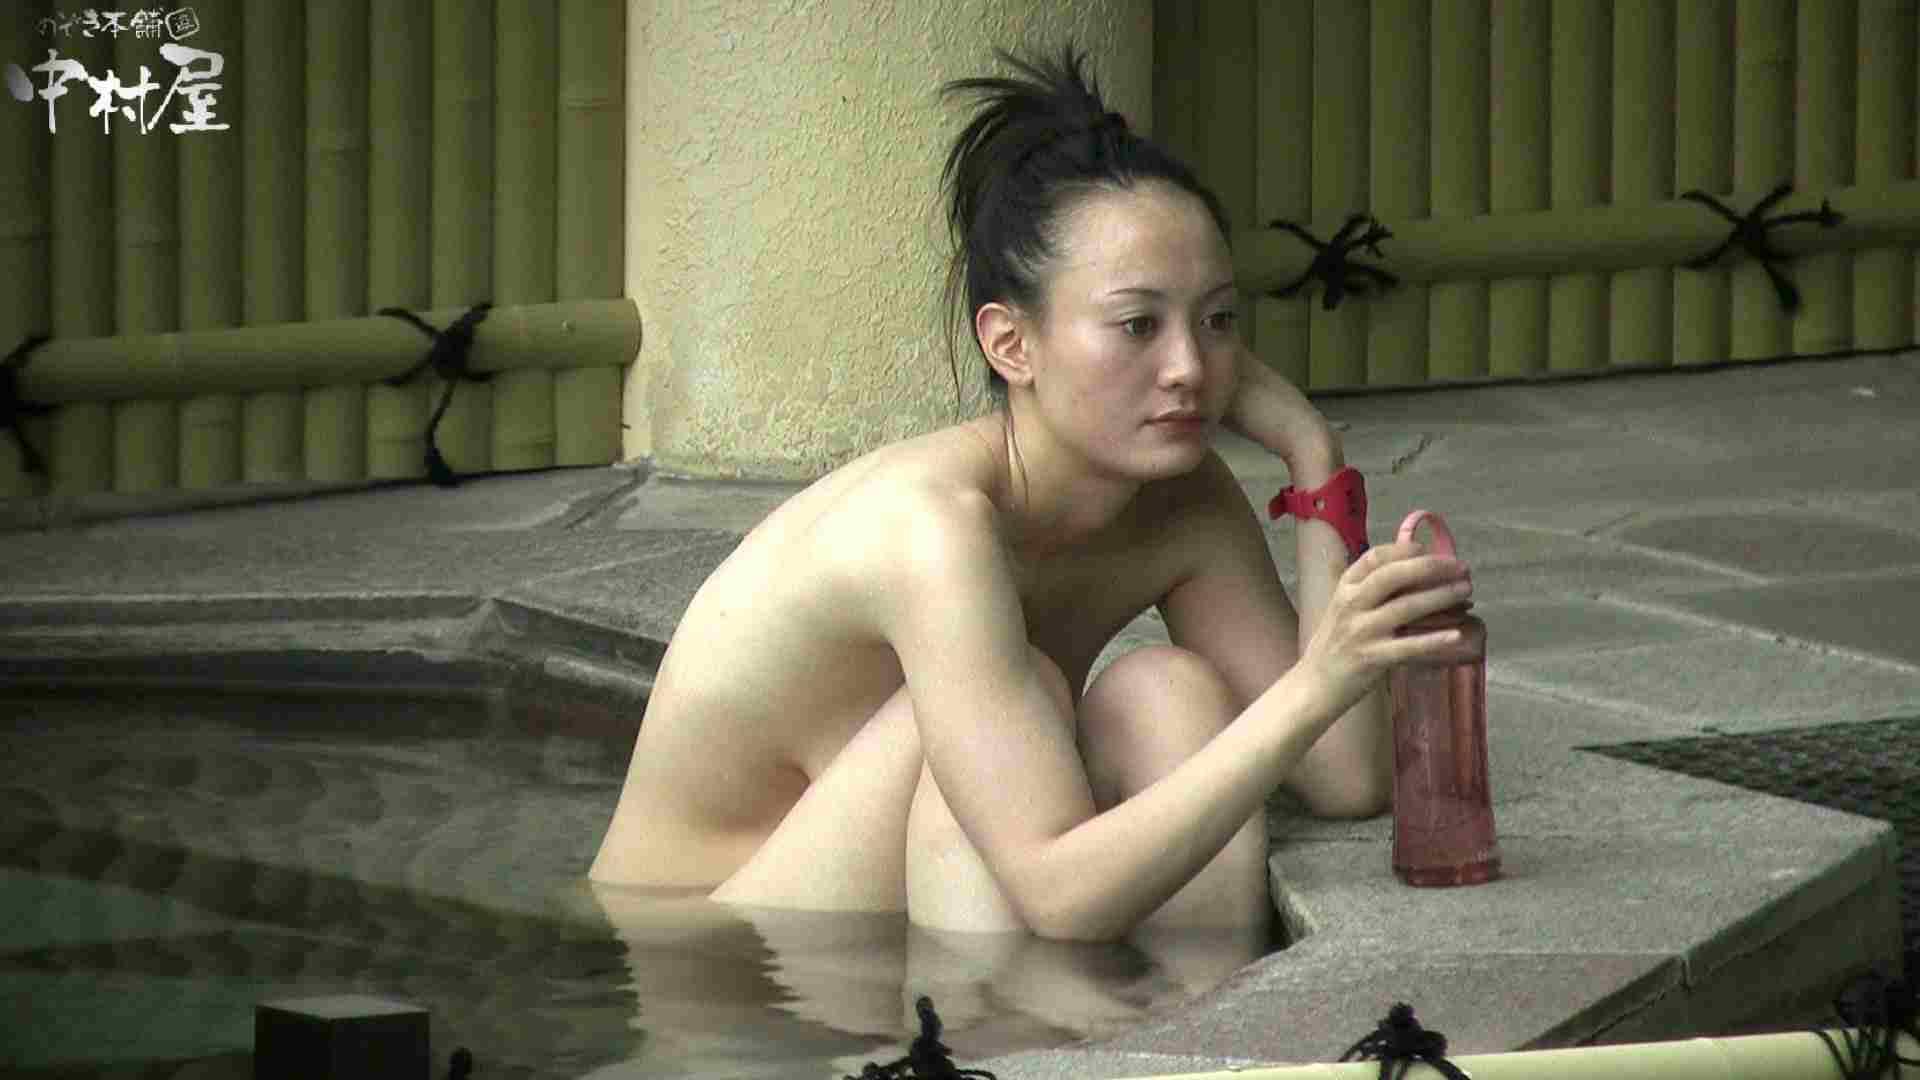 Aquaな露天風呂Vol.900 盗撮シリーズ | 露天風呂編  110PIX 83